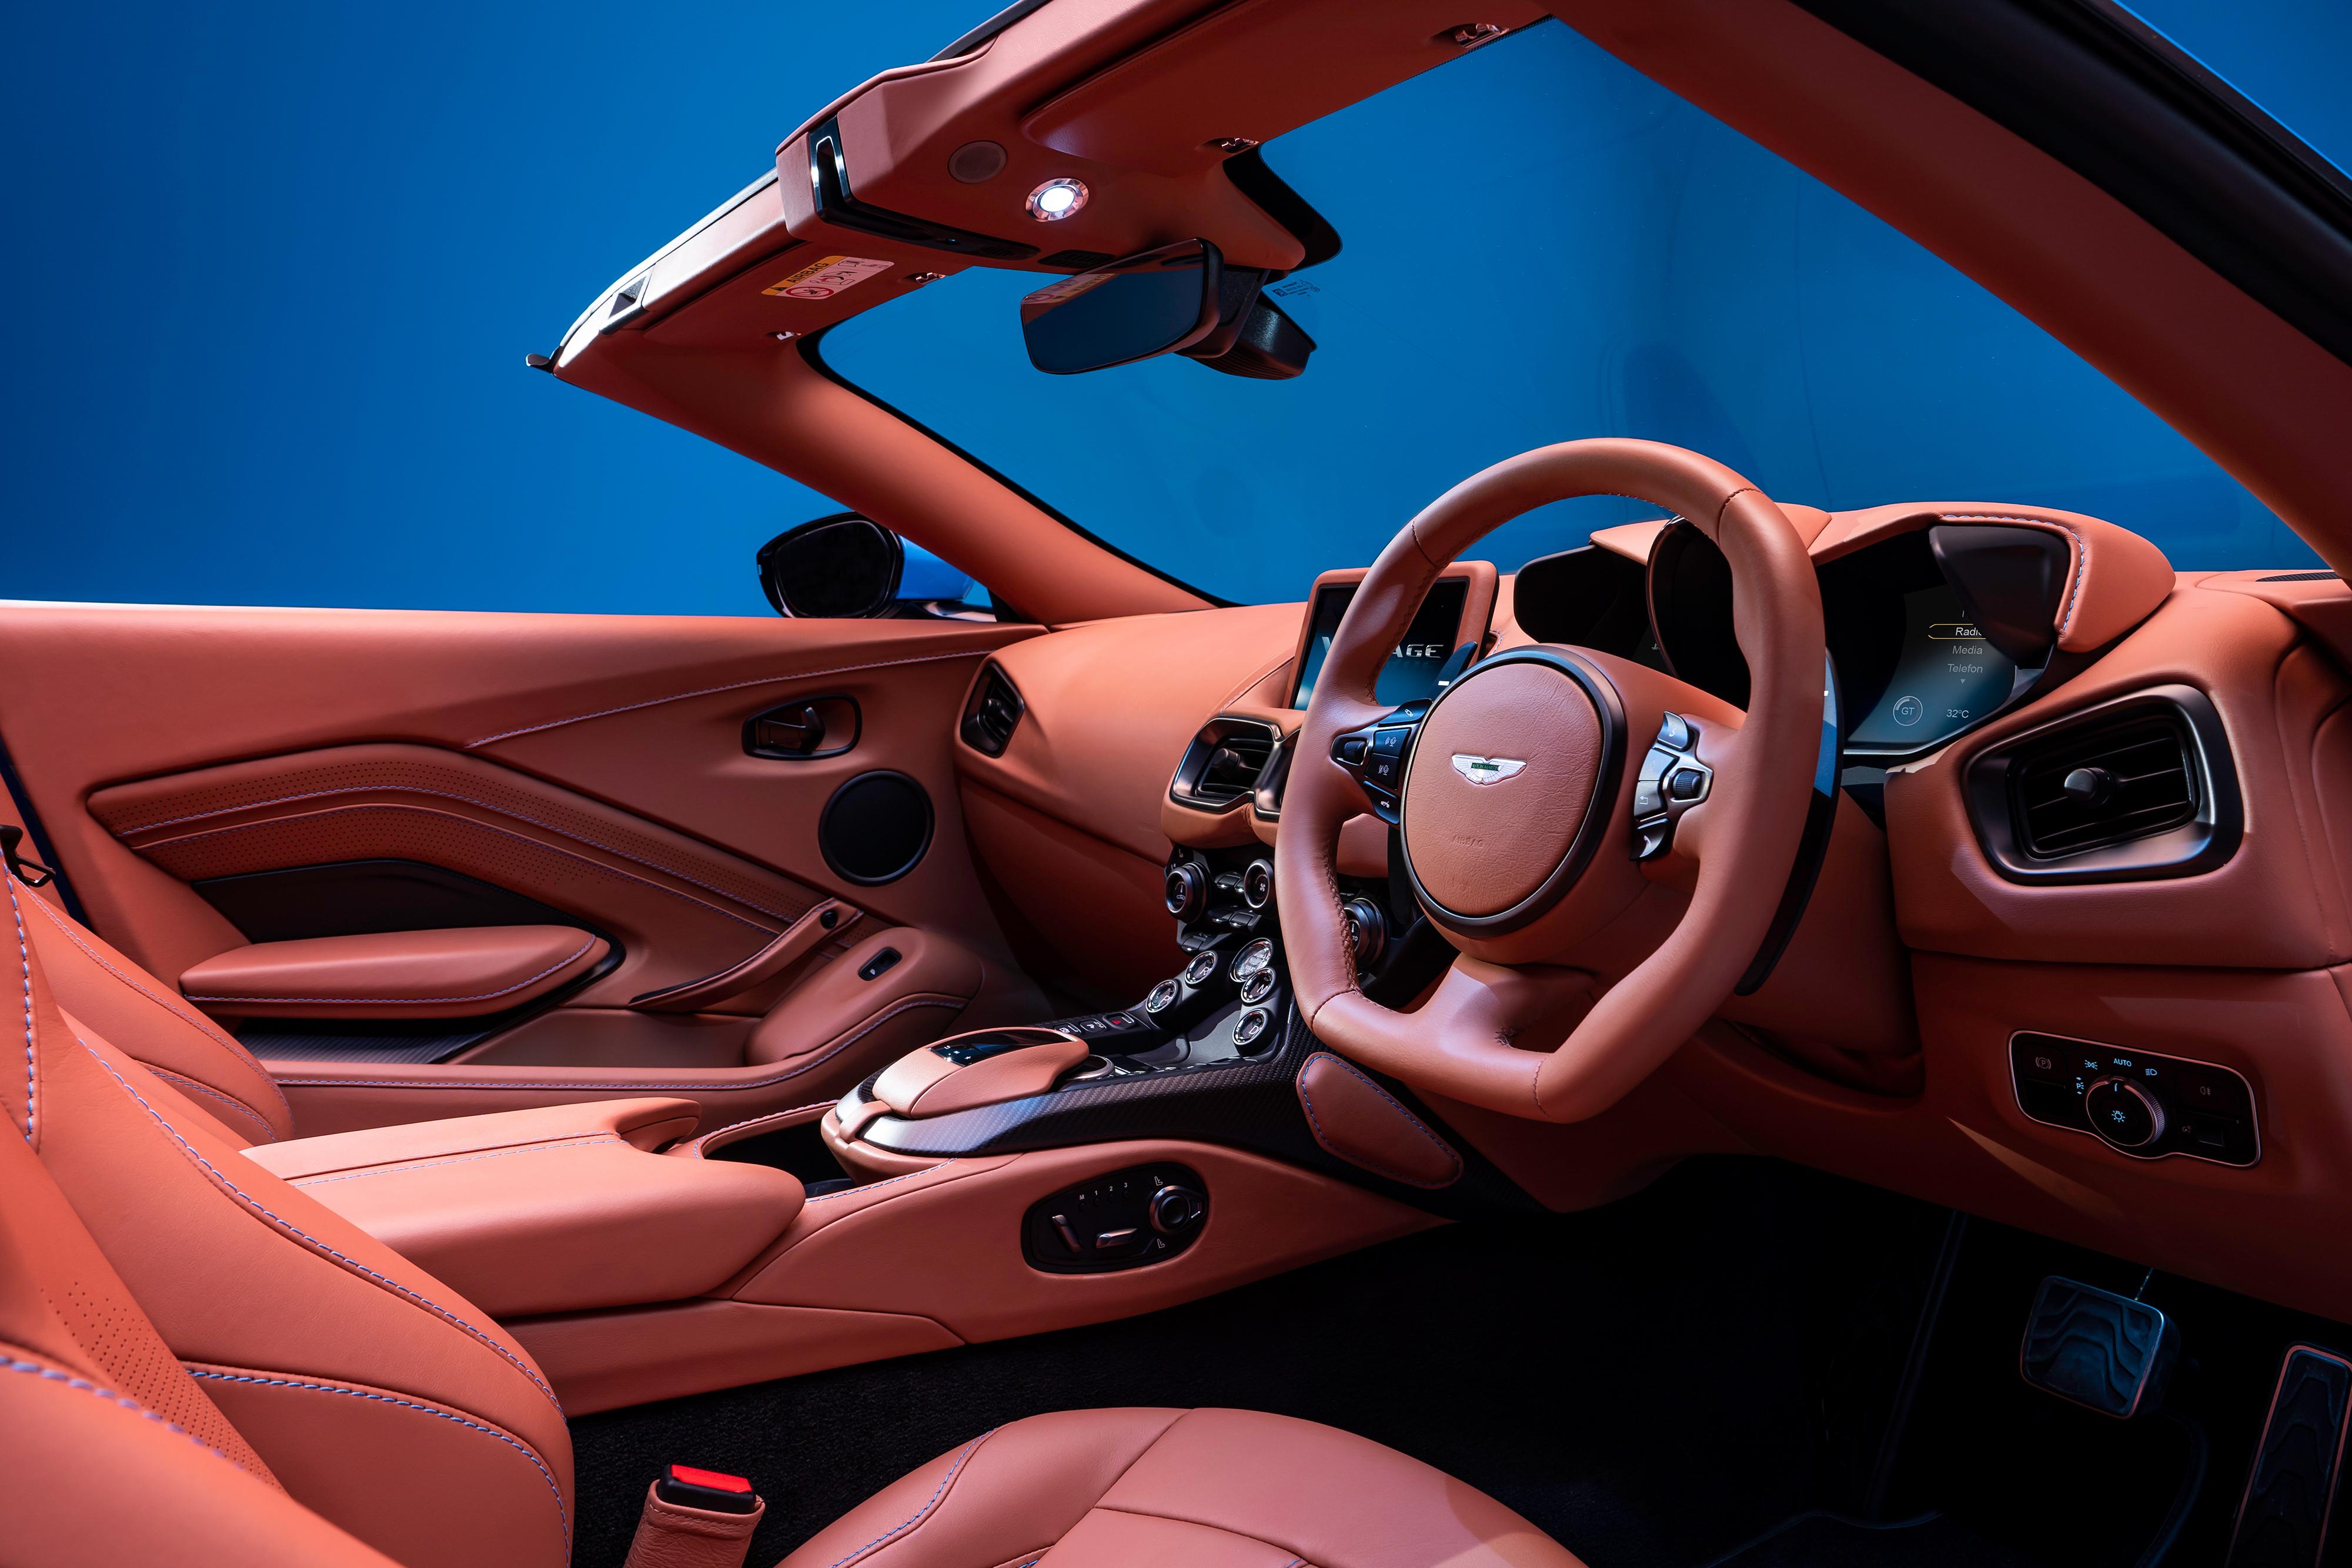 2020-aston-martin-vantage-roadster-9.jpg